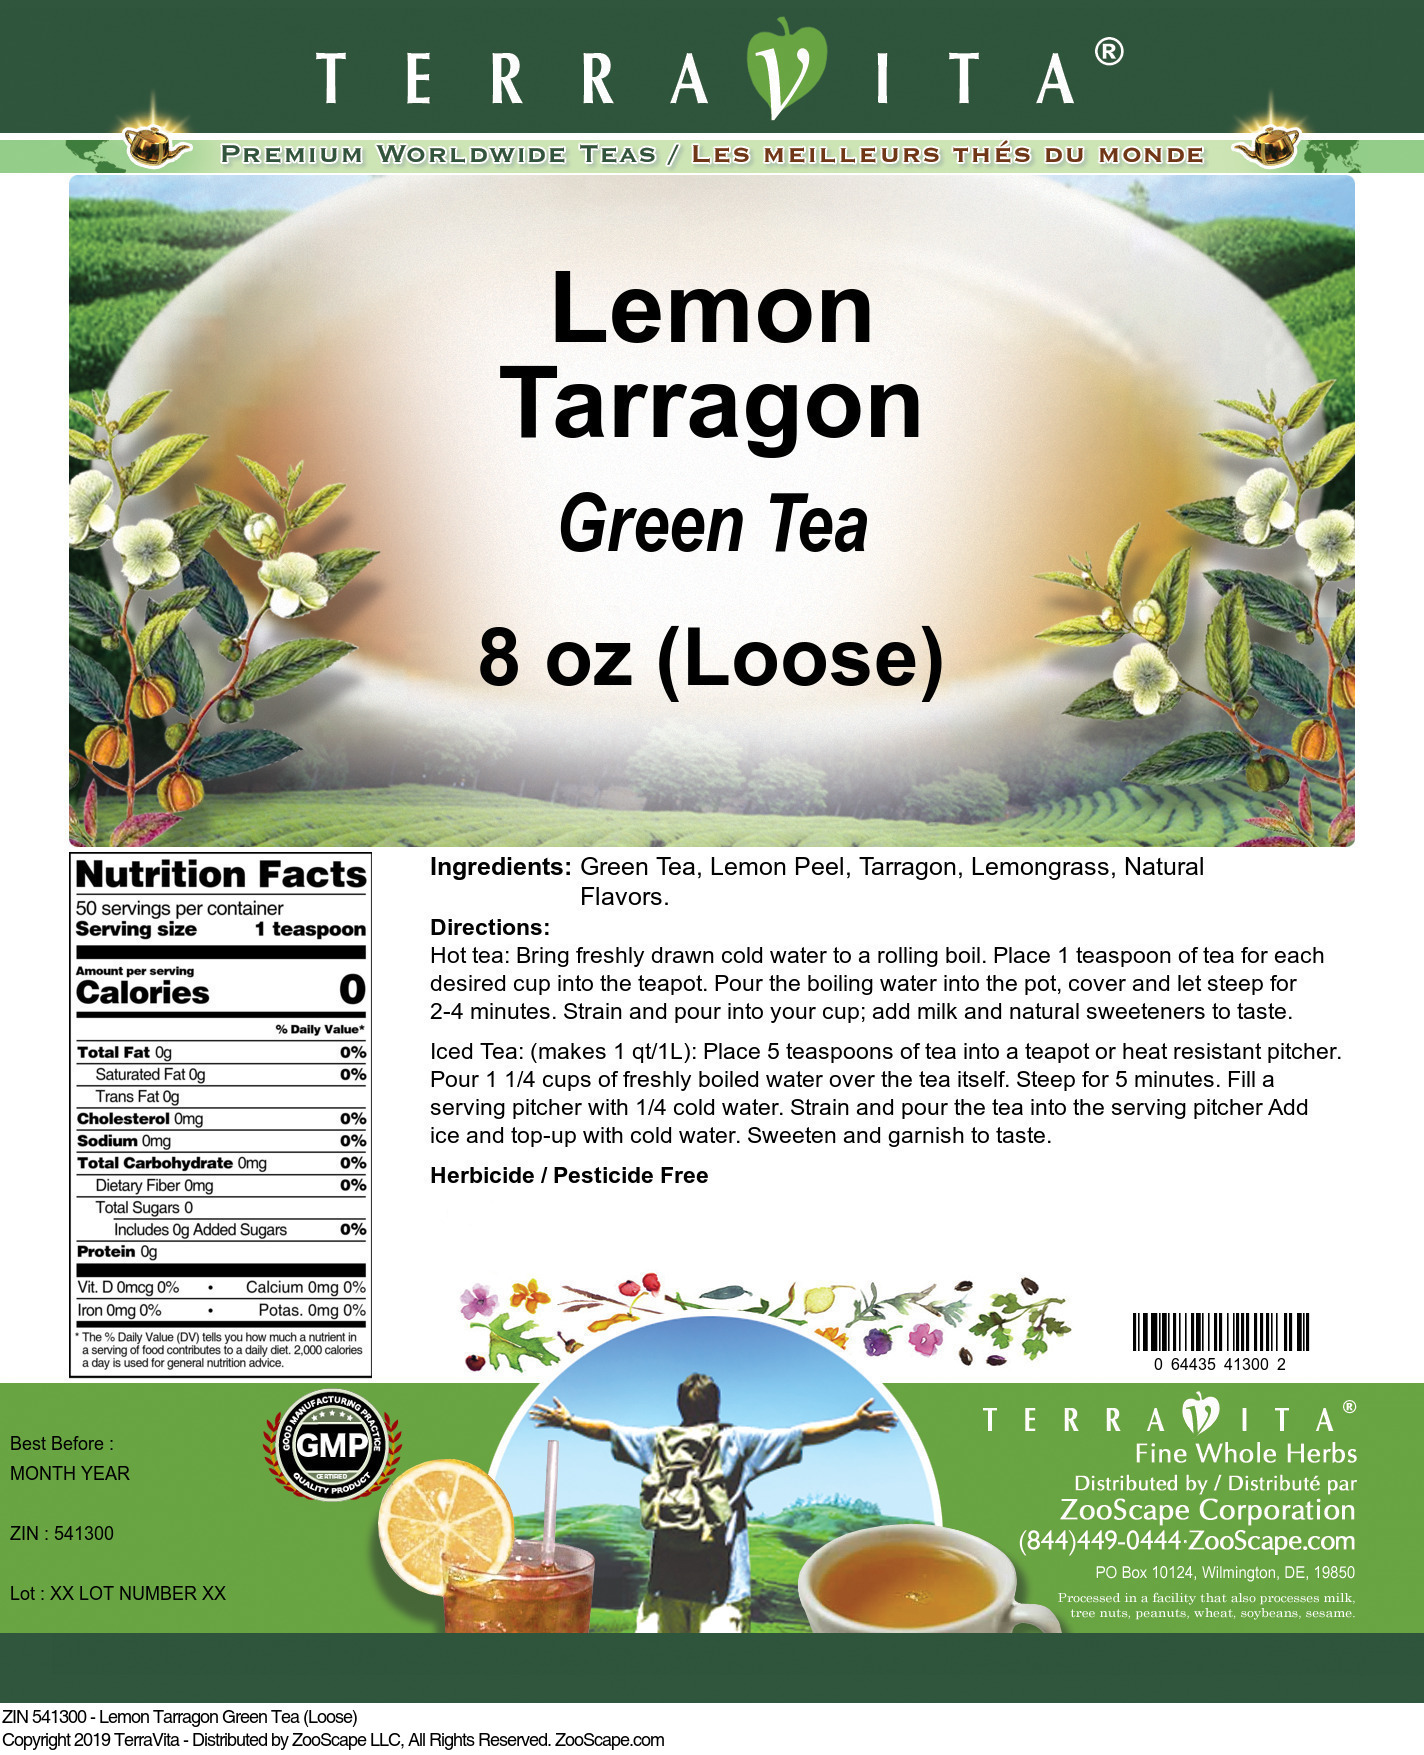 Lemon Tarragon Green Tea (Loose)